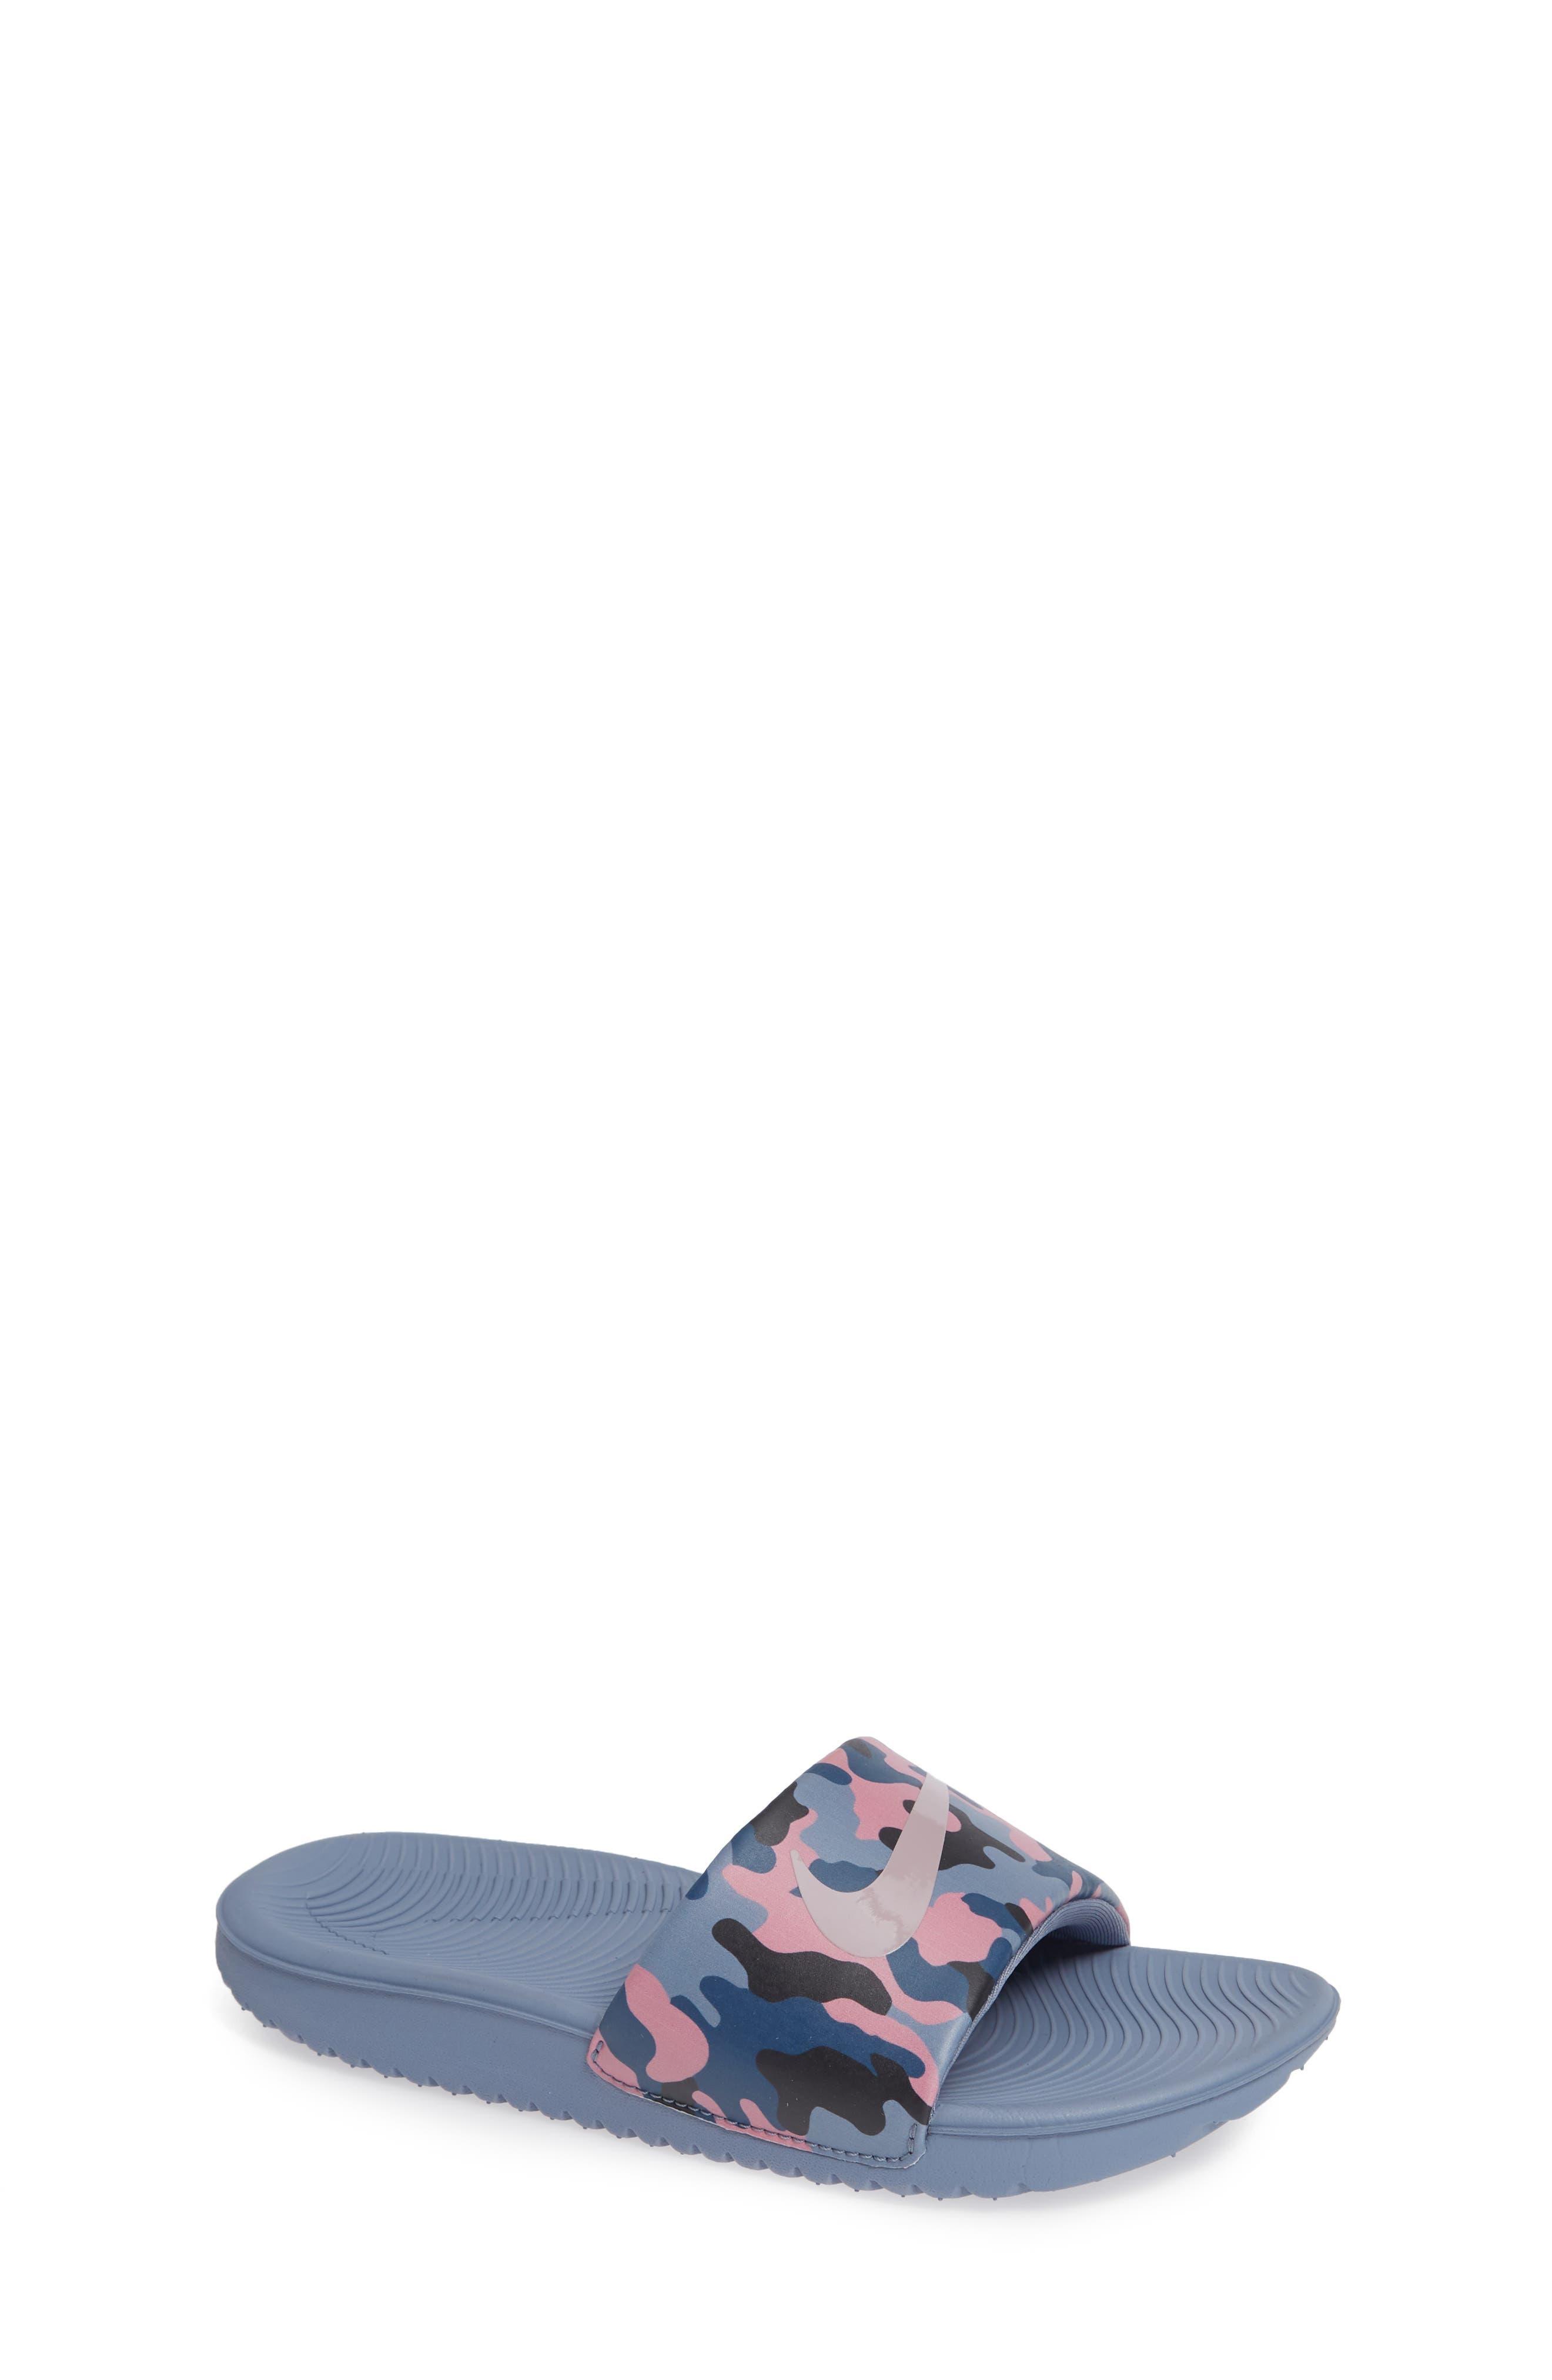 Kawa Slide Sandal, Main, color, SLATE/ ROSE/ DIFFUSED BLUE